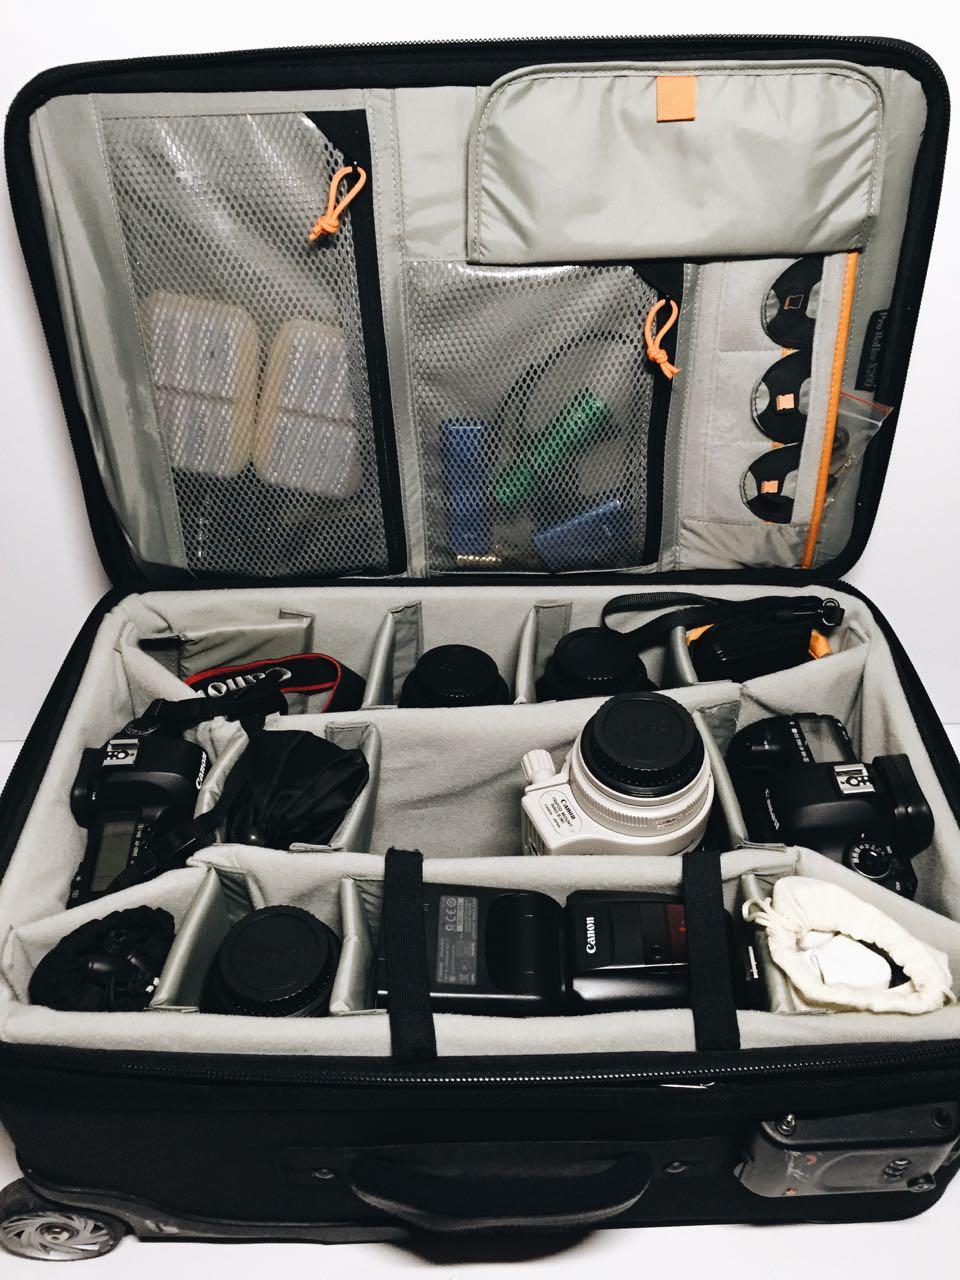 Camera equipment bag - LowePro x200